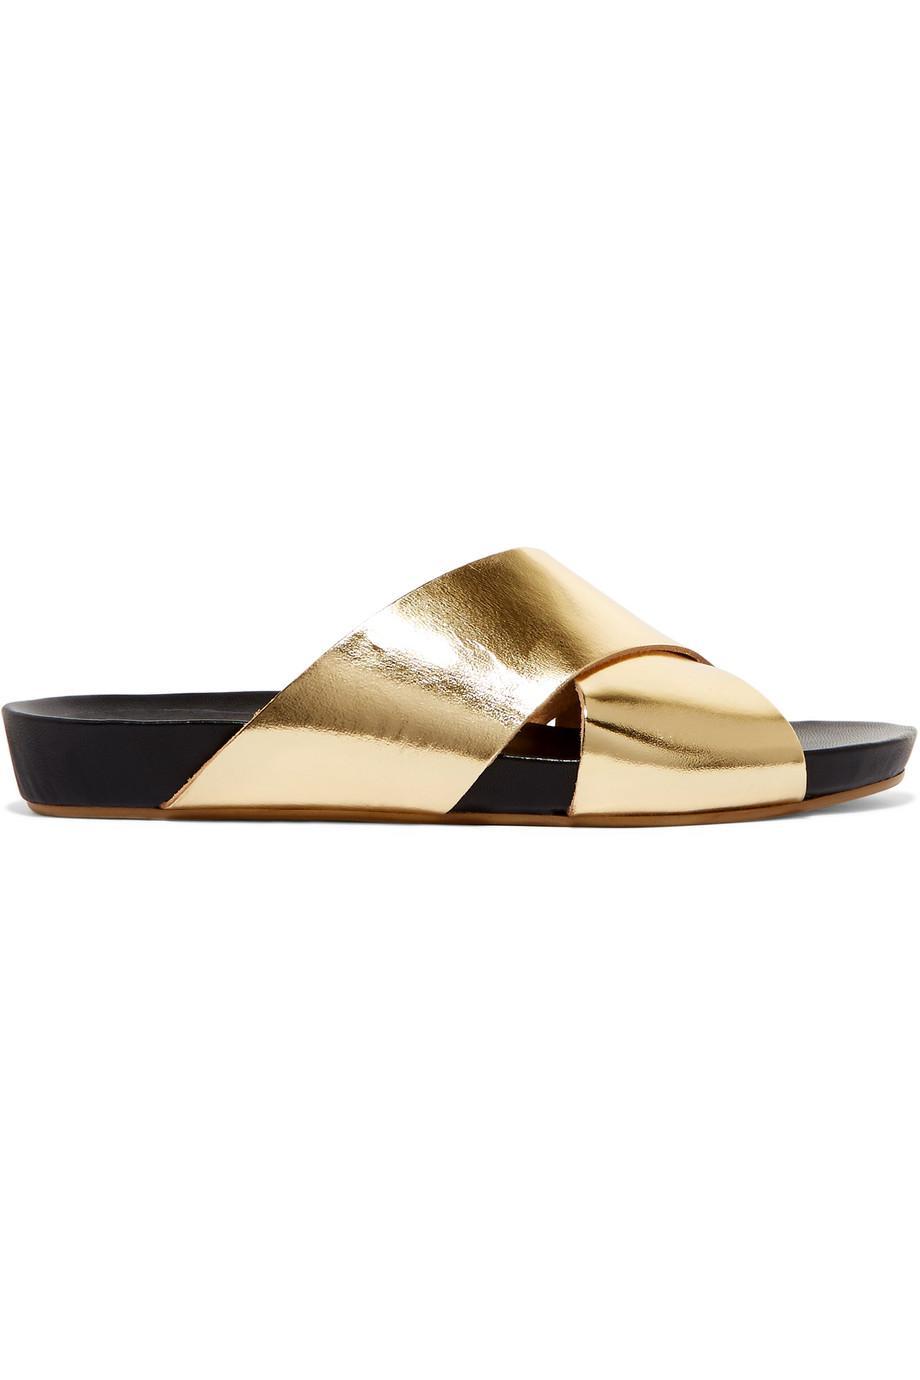 Doris Metallic Leather Slides - Gold ATP Atelier P2Pz6DLg